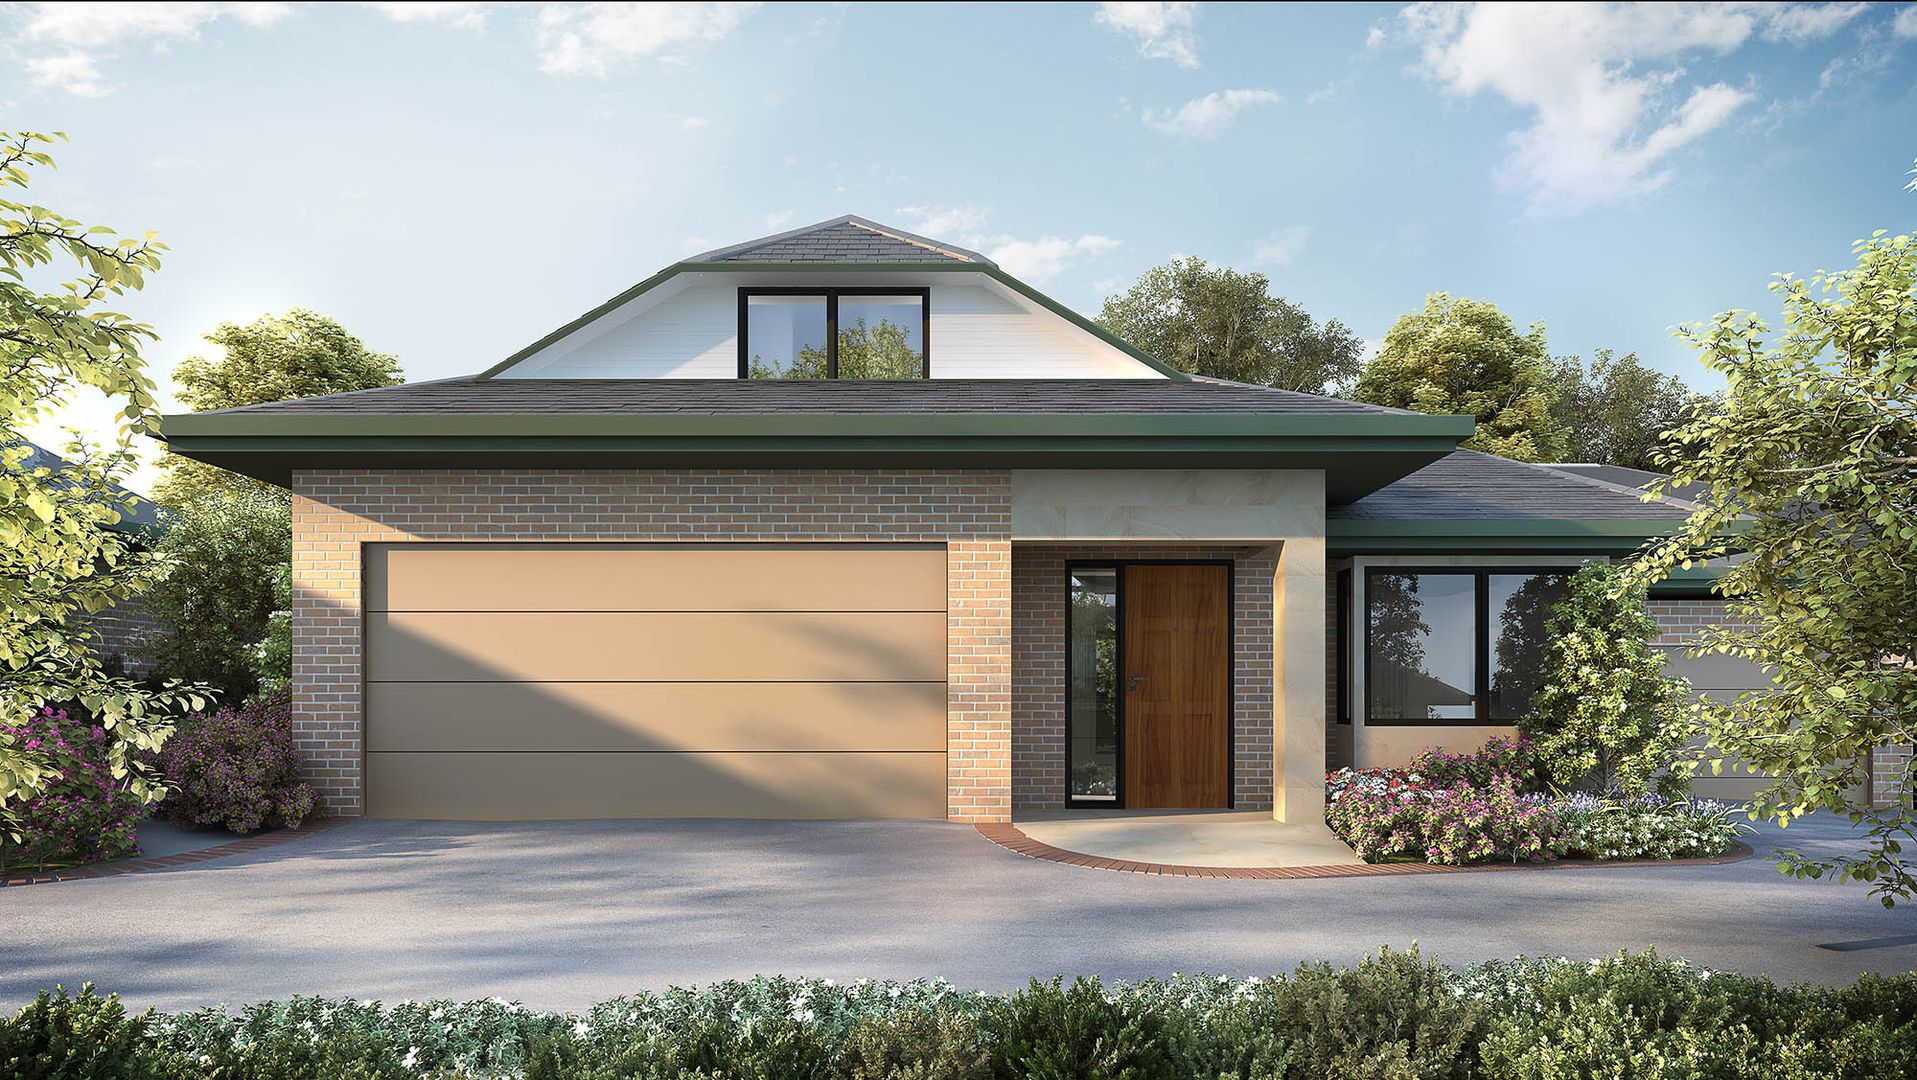 2/3-5 Copeland  Road, Beecroft NSW 2119, Image 0